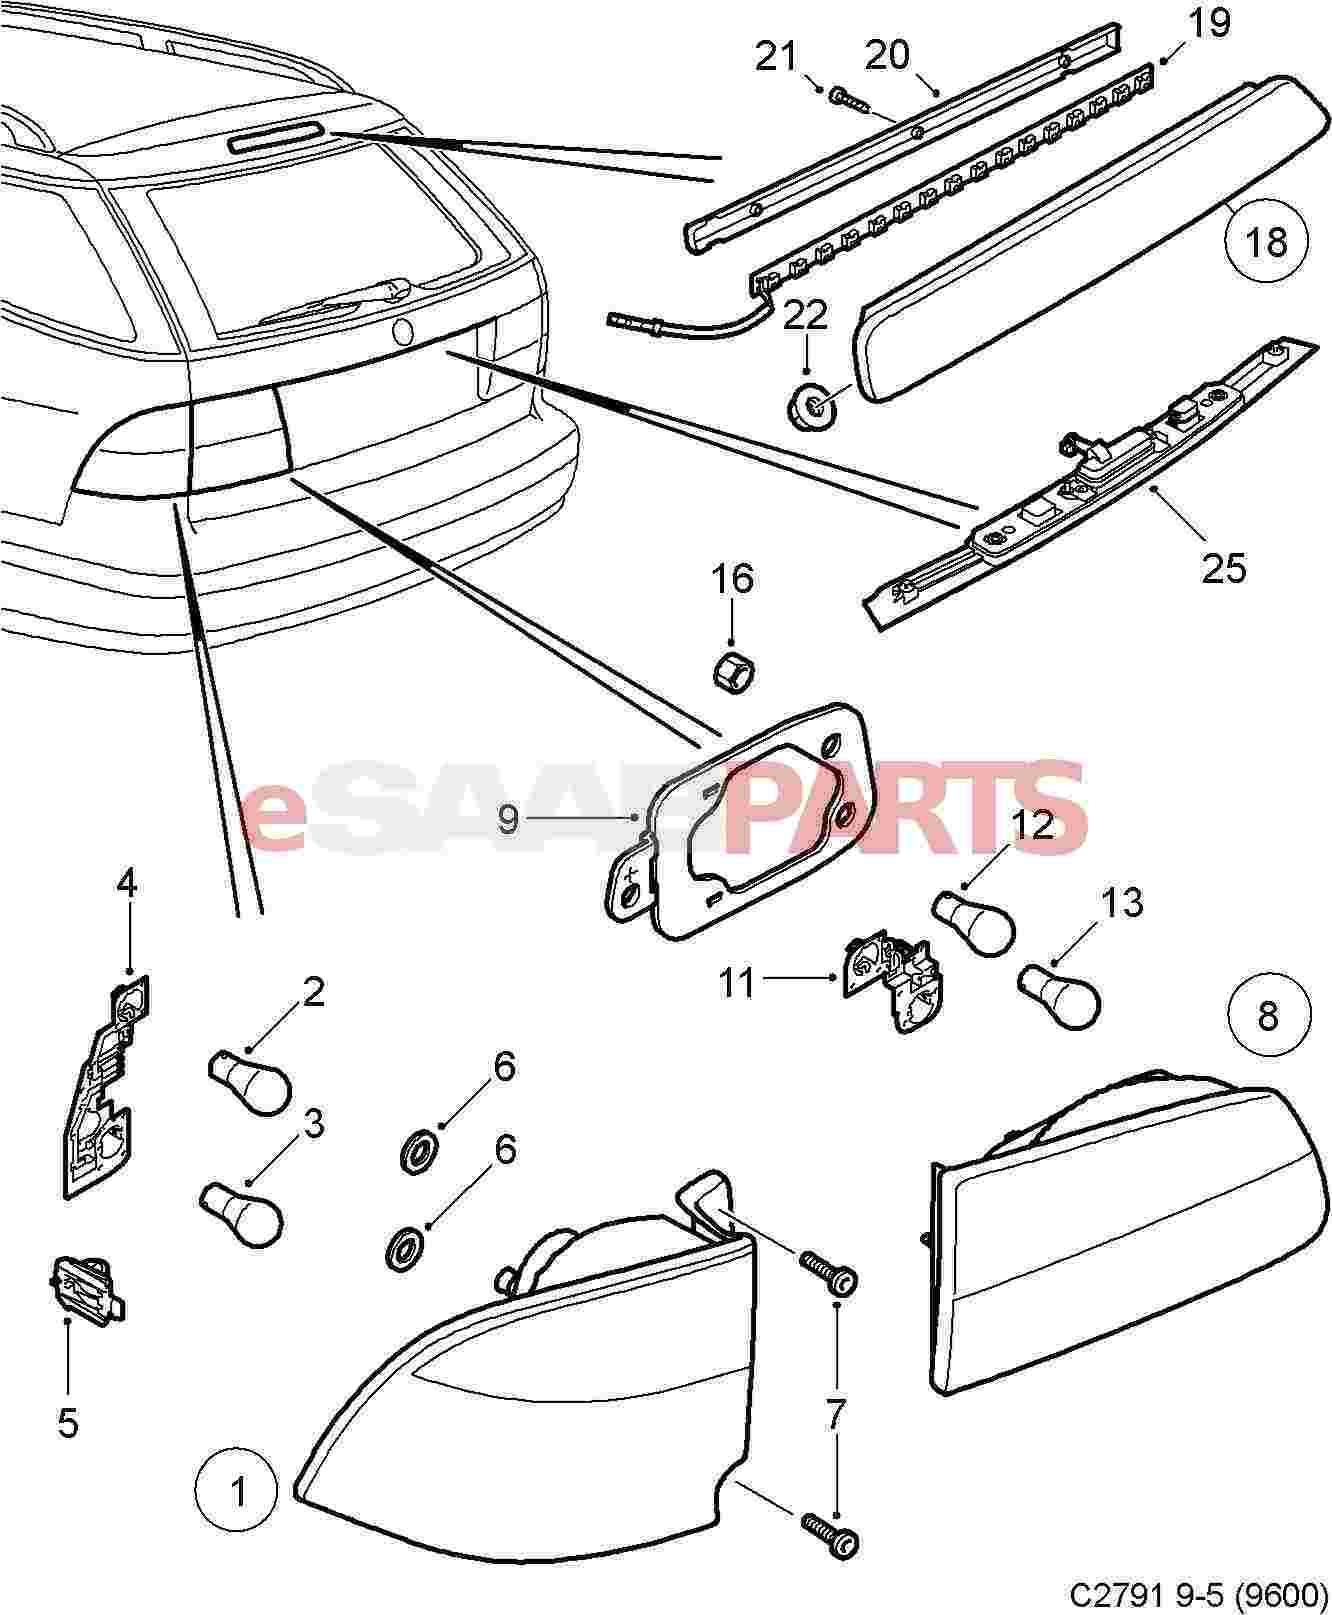 12 Volt Headlight Wiring